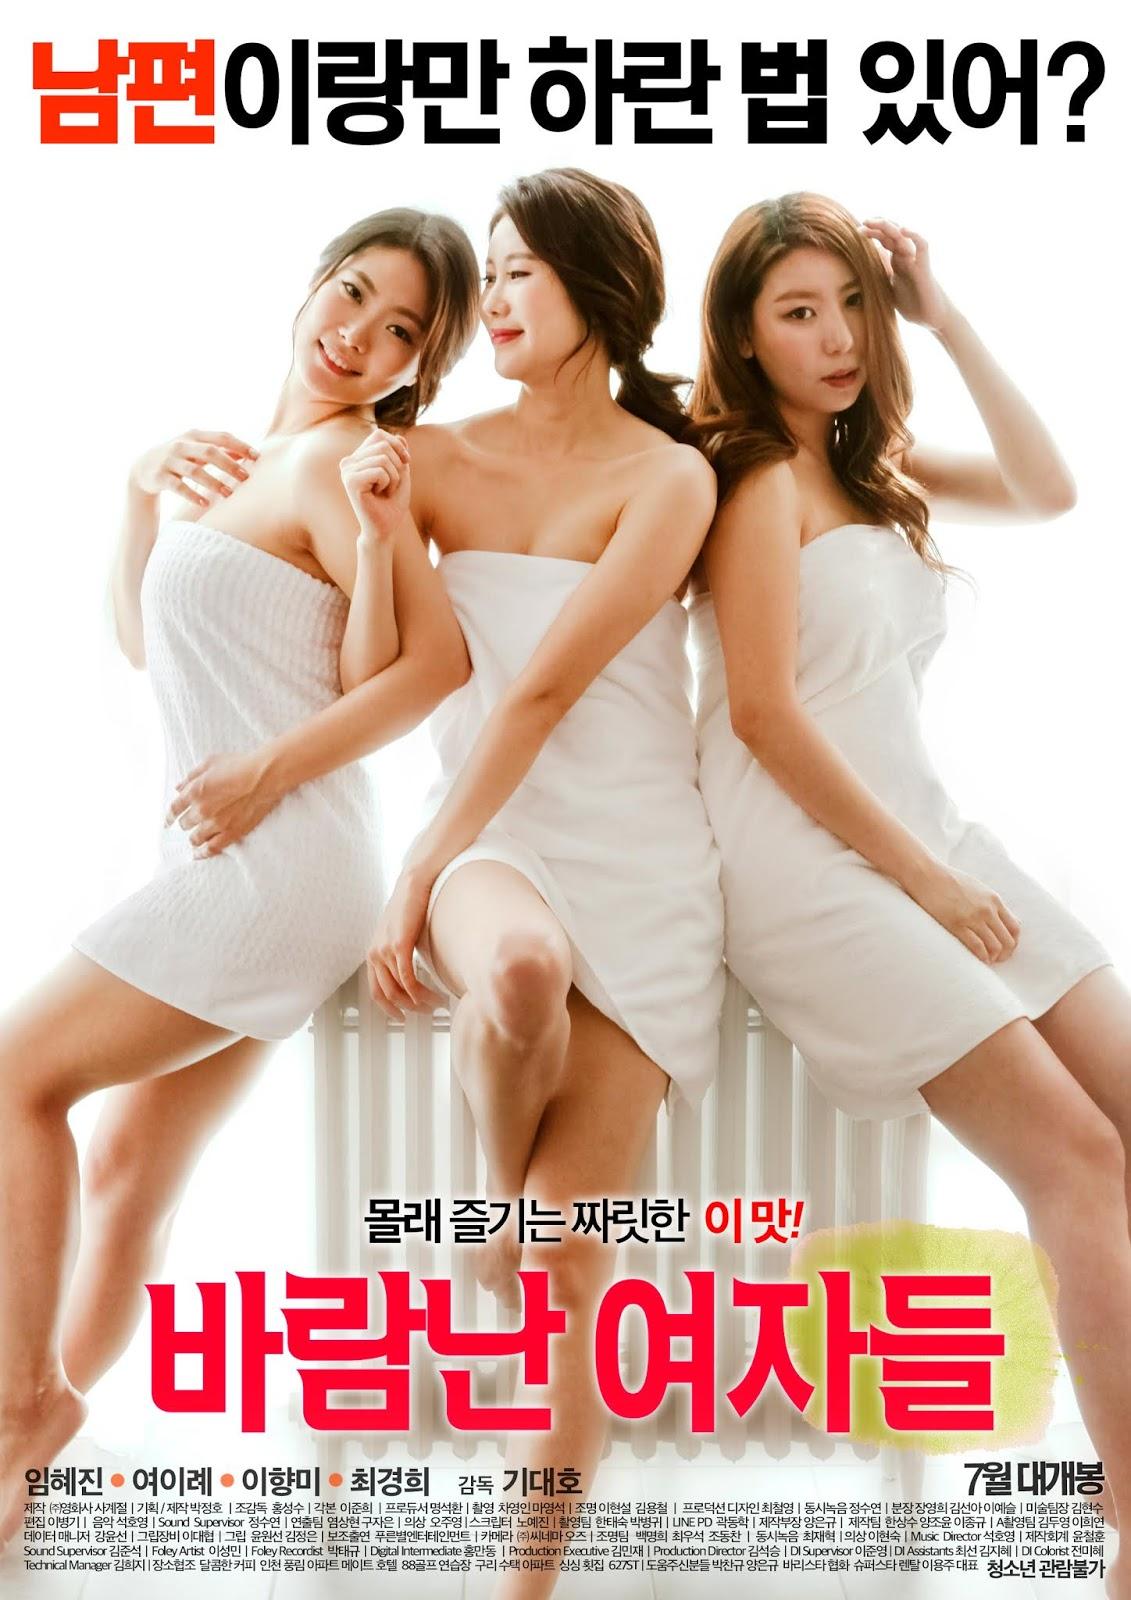 Cheating women Full Korea 18+ Adult Movie Online Free